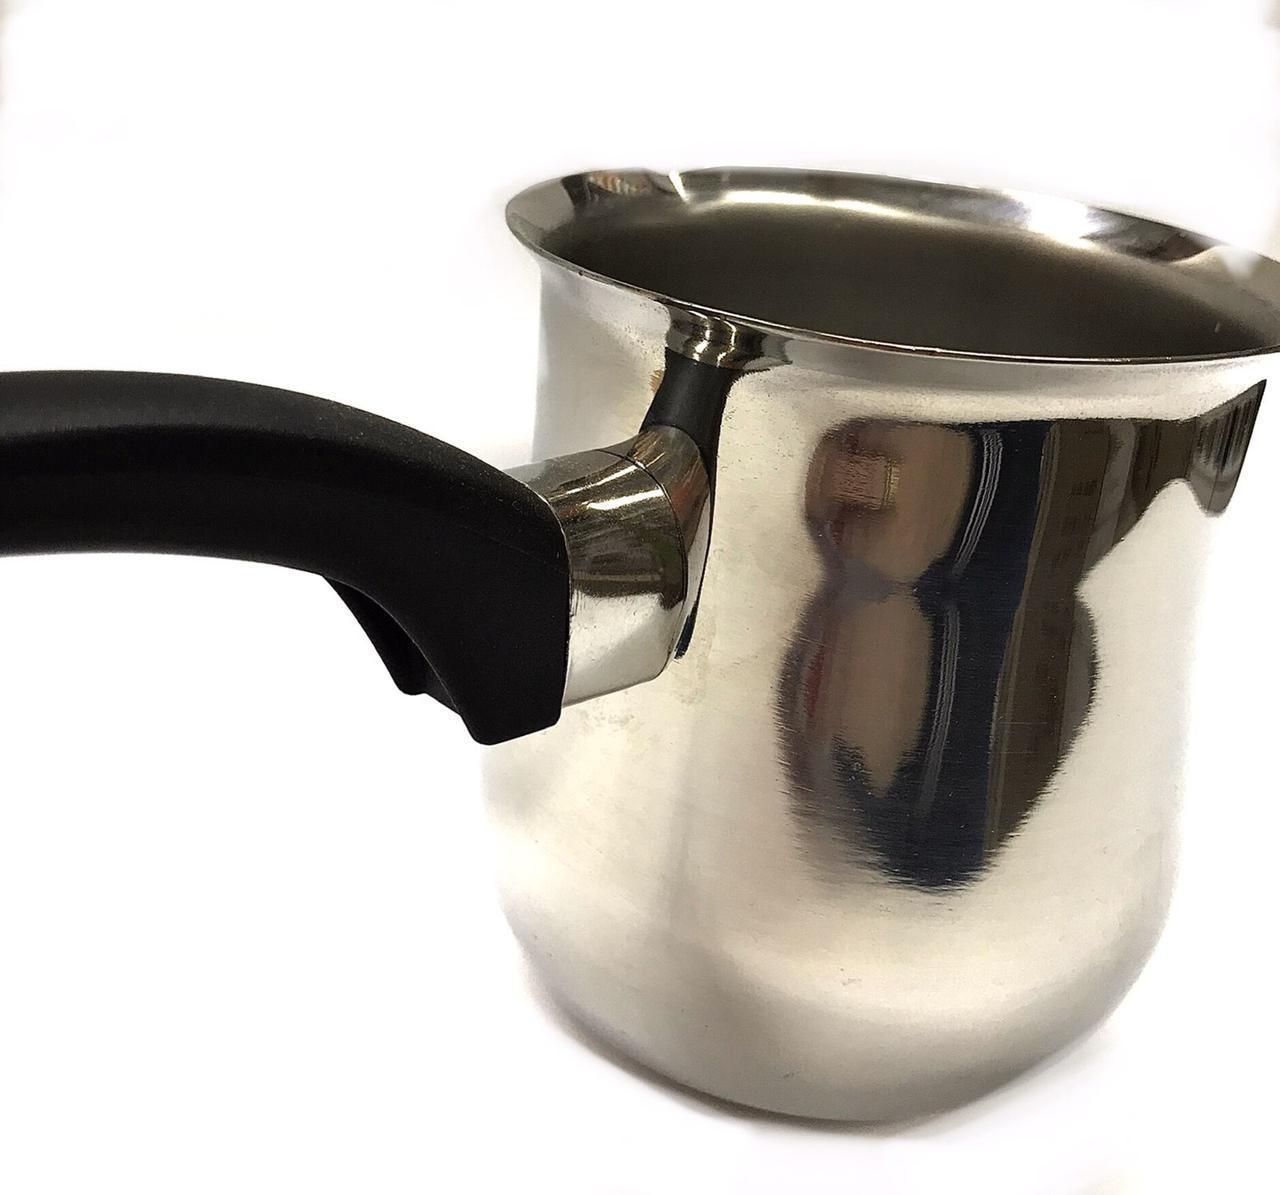 Турка Benson BN-656 из нержавеющей стали (2 шт.) 700 мл   турка для плиты Бенсон, кофеварка Бэнсон